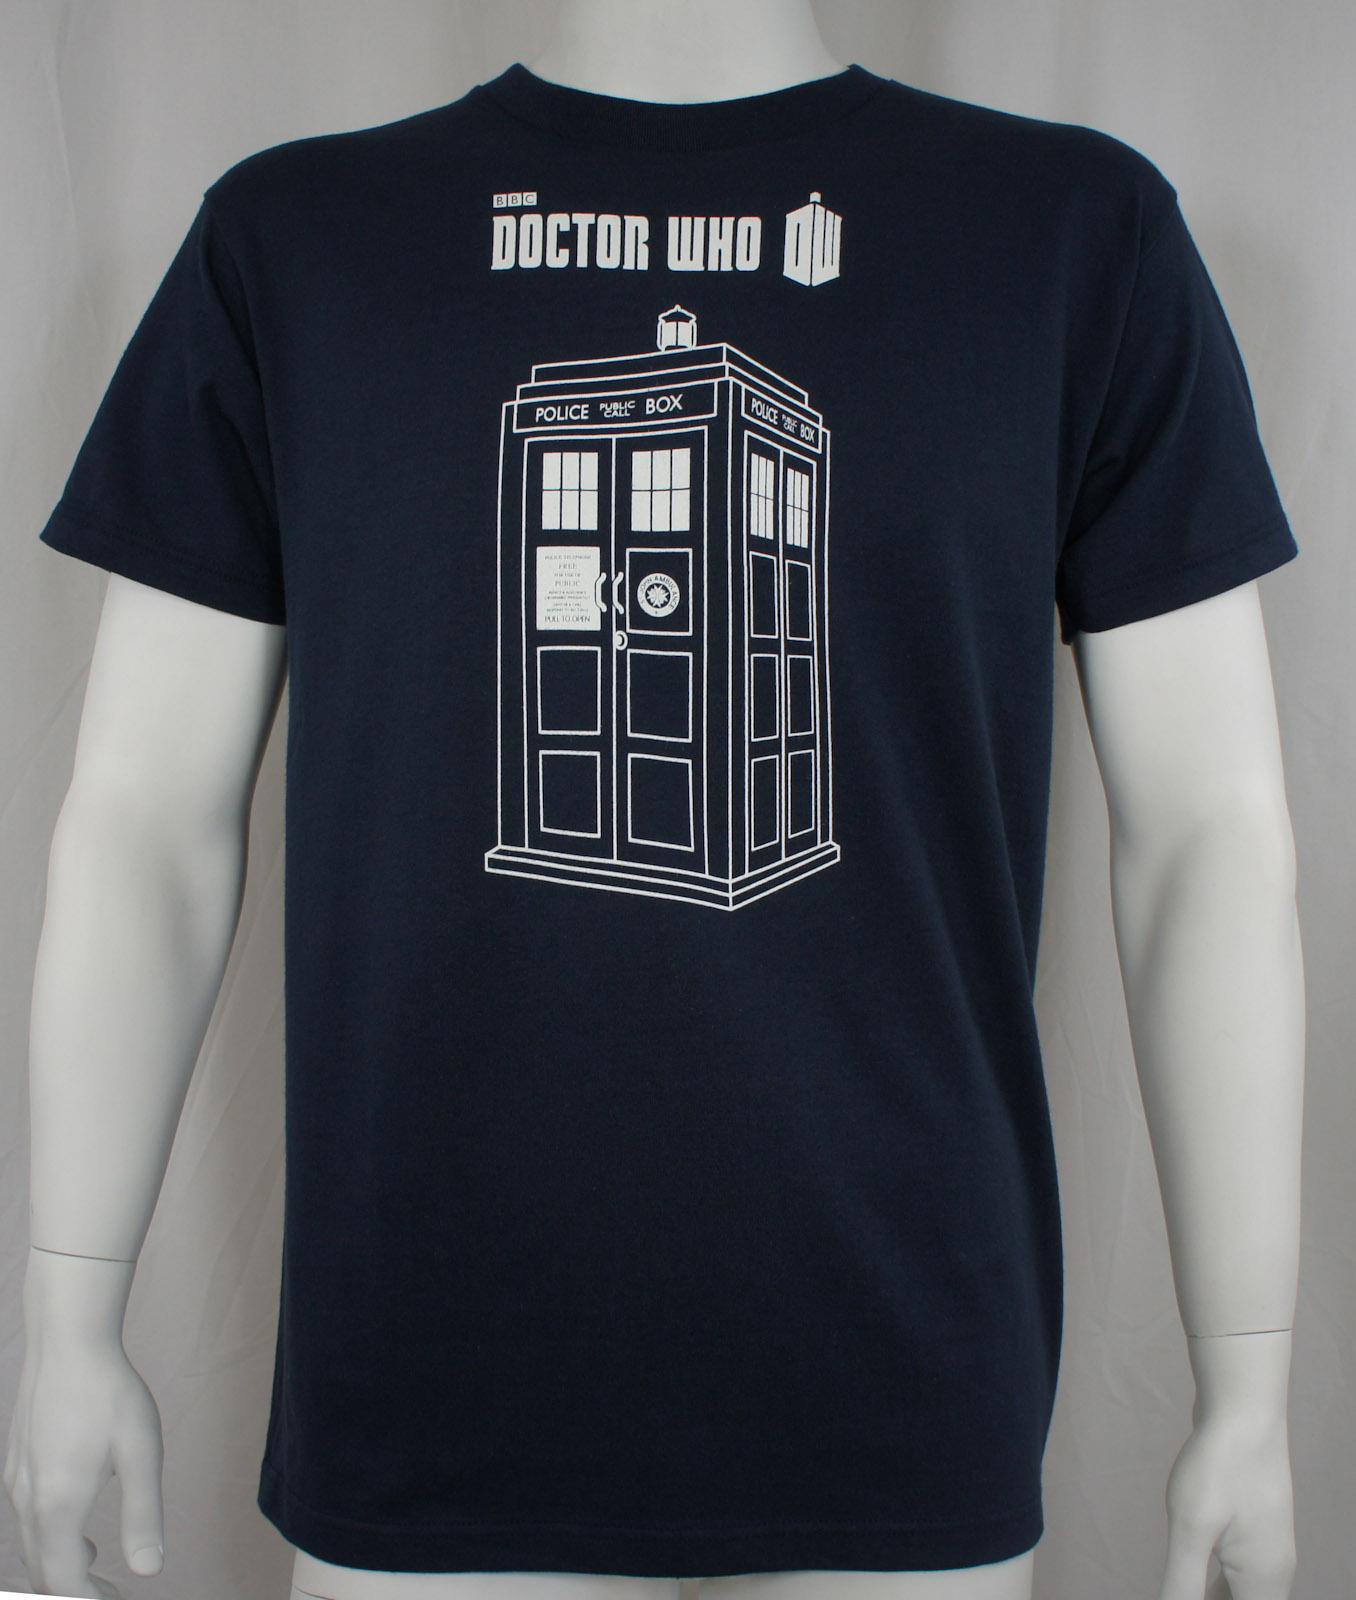 T shirt design keep calm - Authentic Dr Doctor Who Dalek Tardis Keep Calm